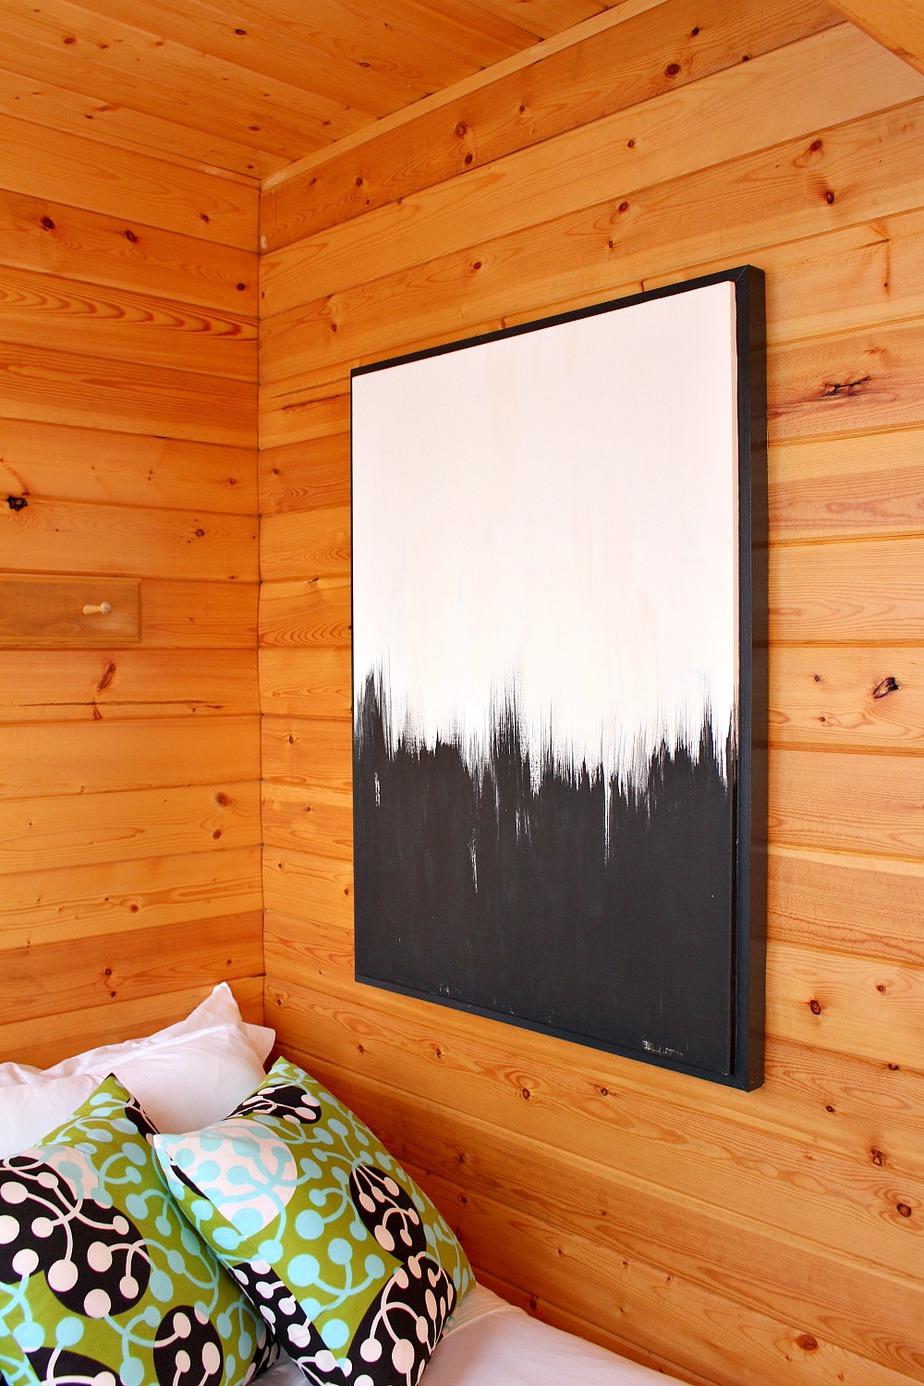 11.Artwork on Walls By Simphome.com